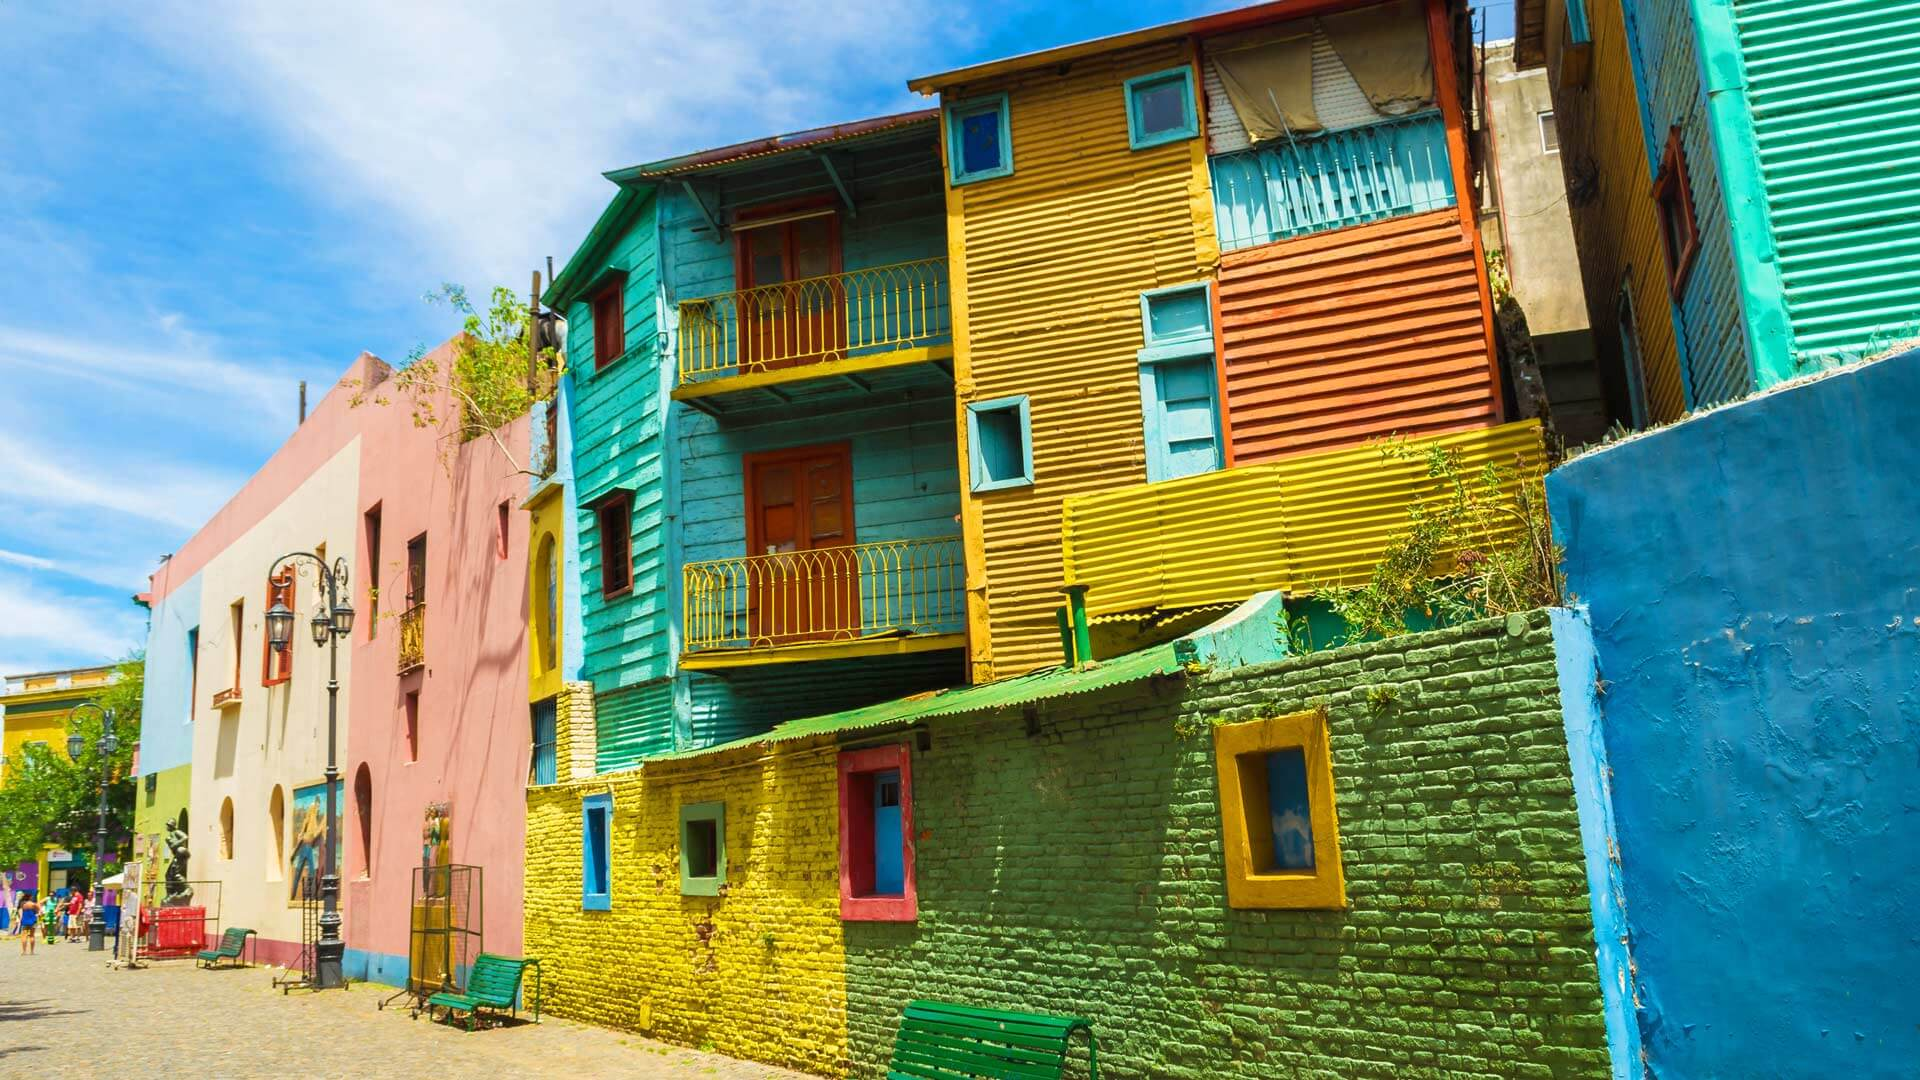 Argentine et Chili, terres des Andes